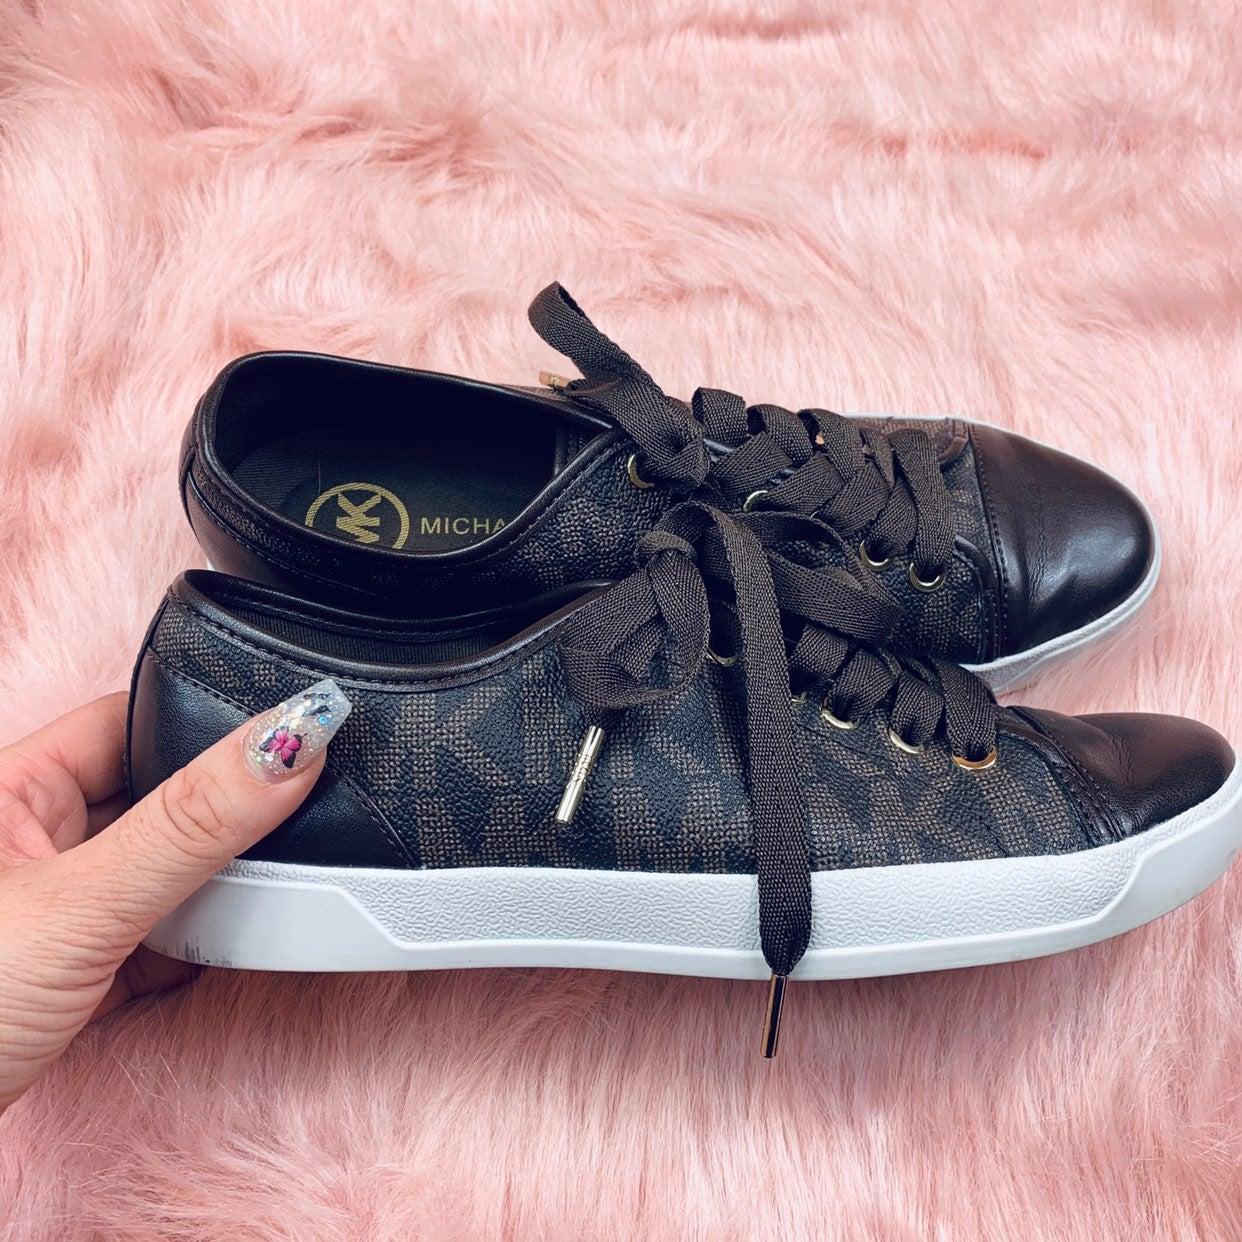 Brown Michael Kors sneakers, size 7